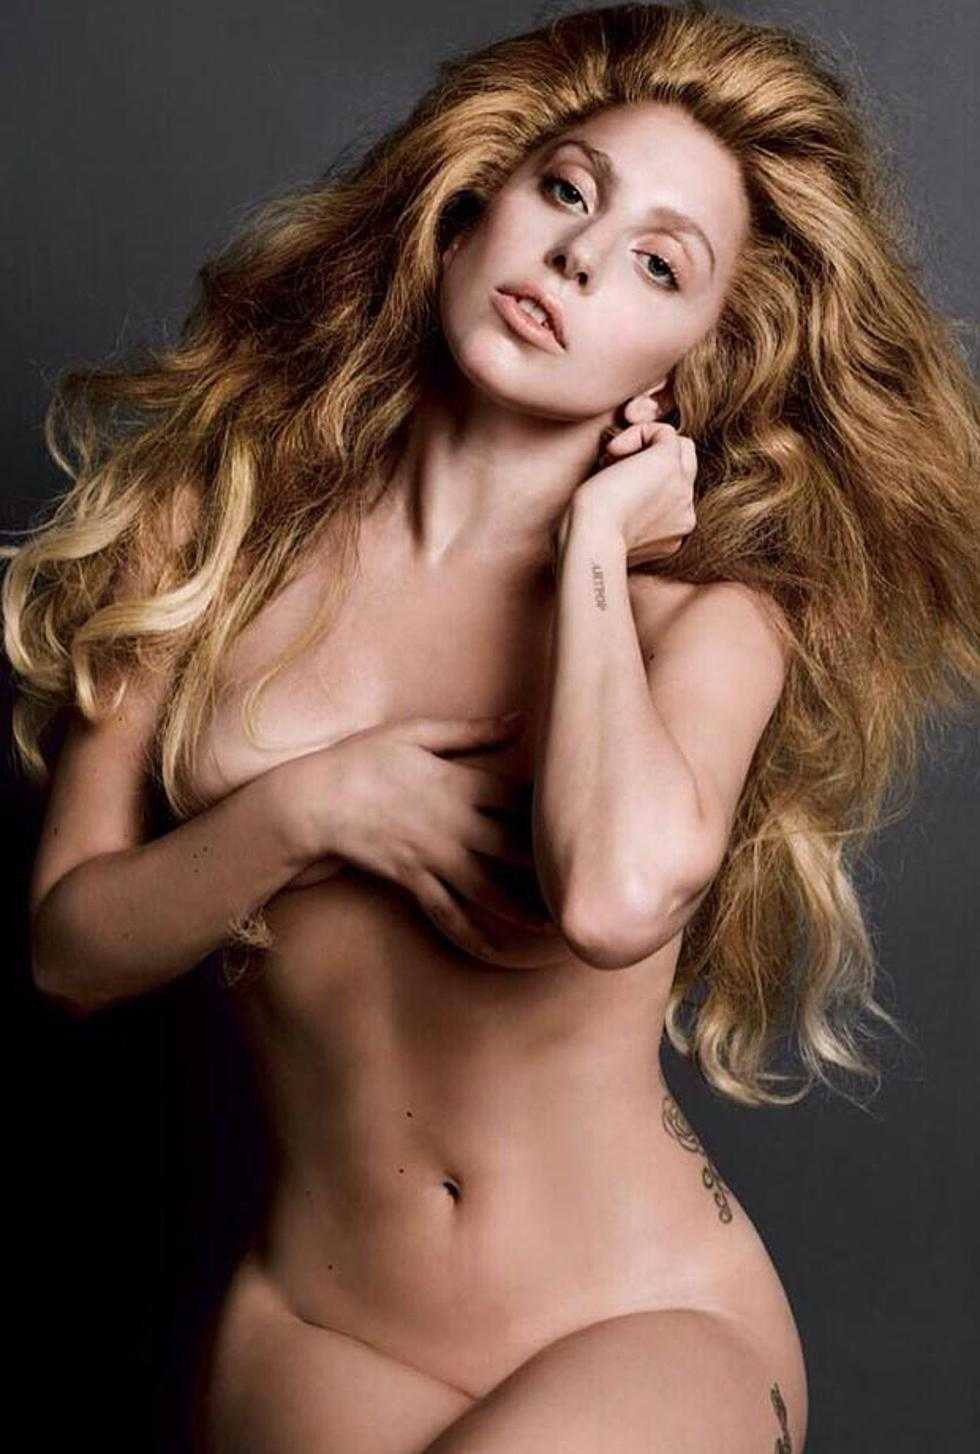 Lady Gaga hot tits pic